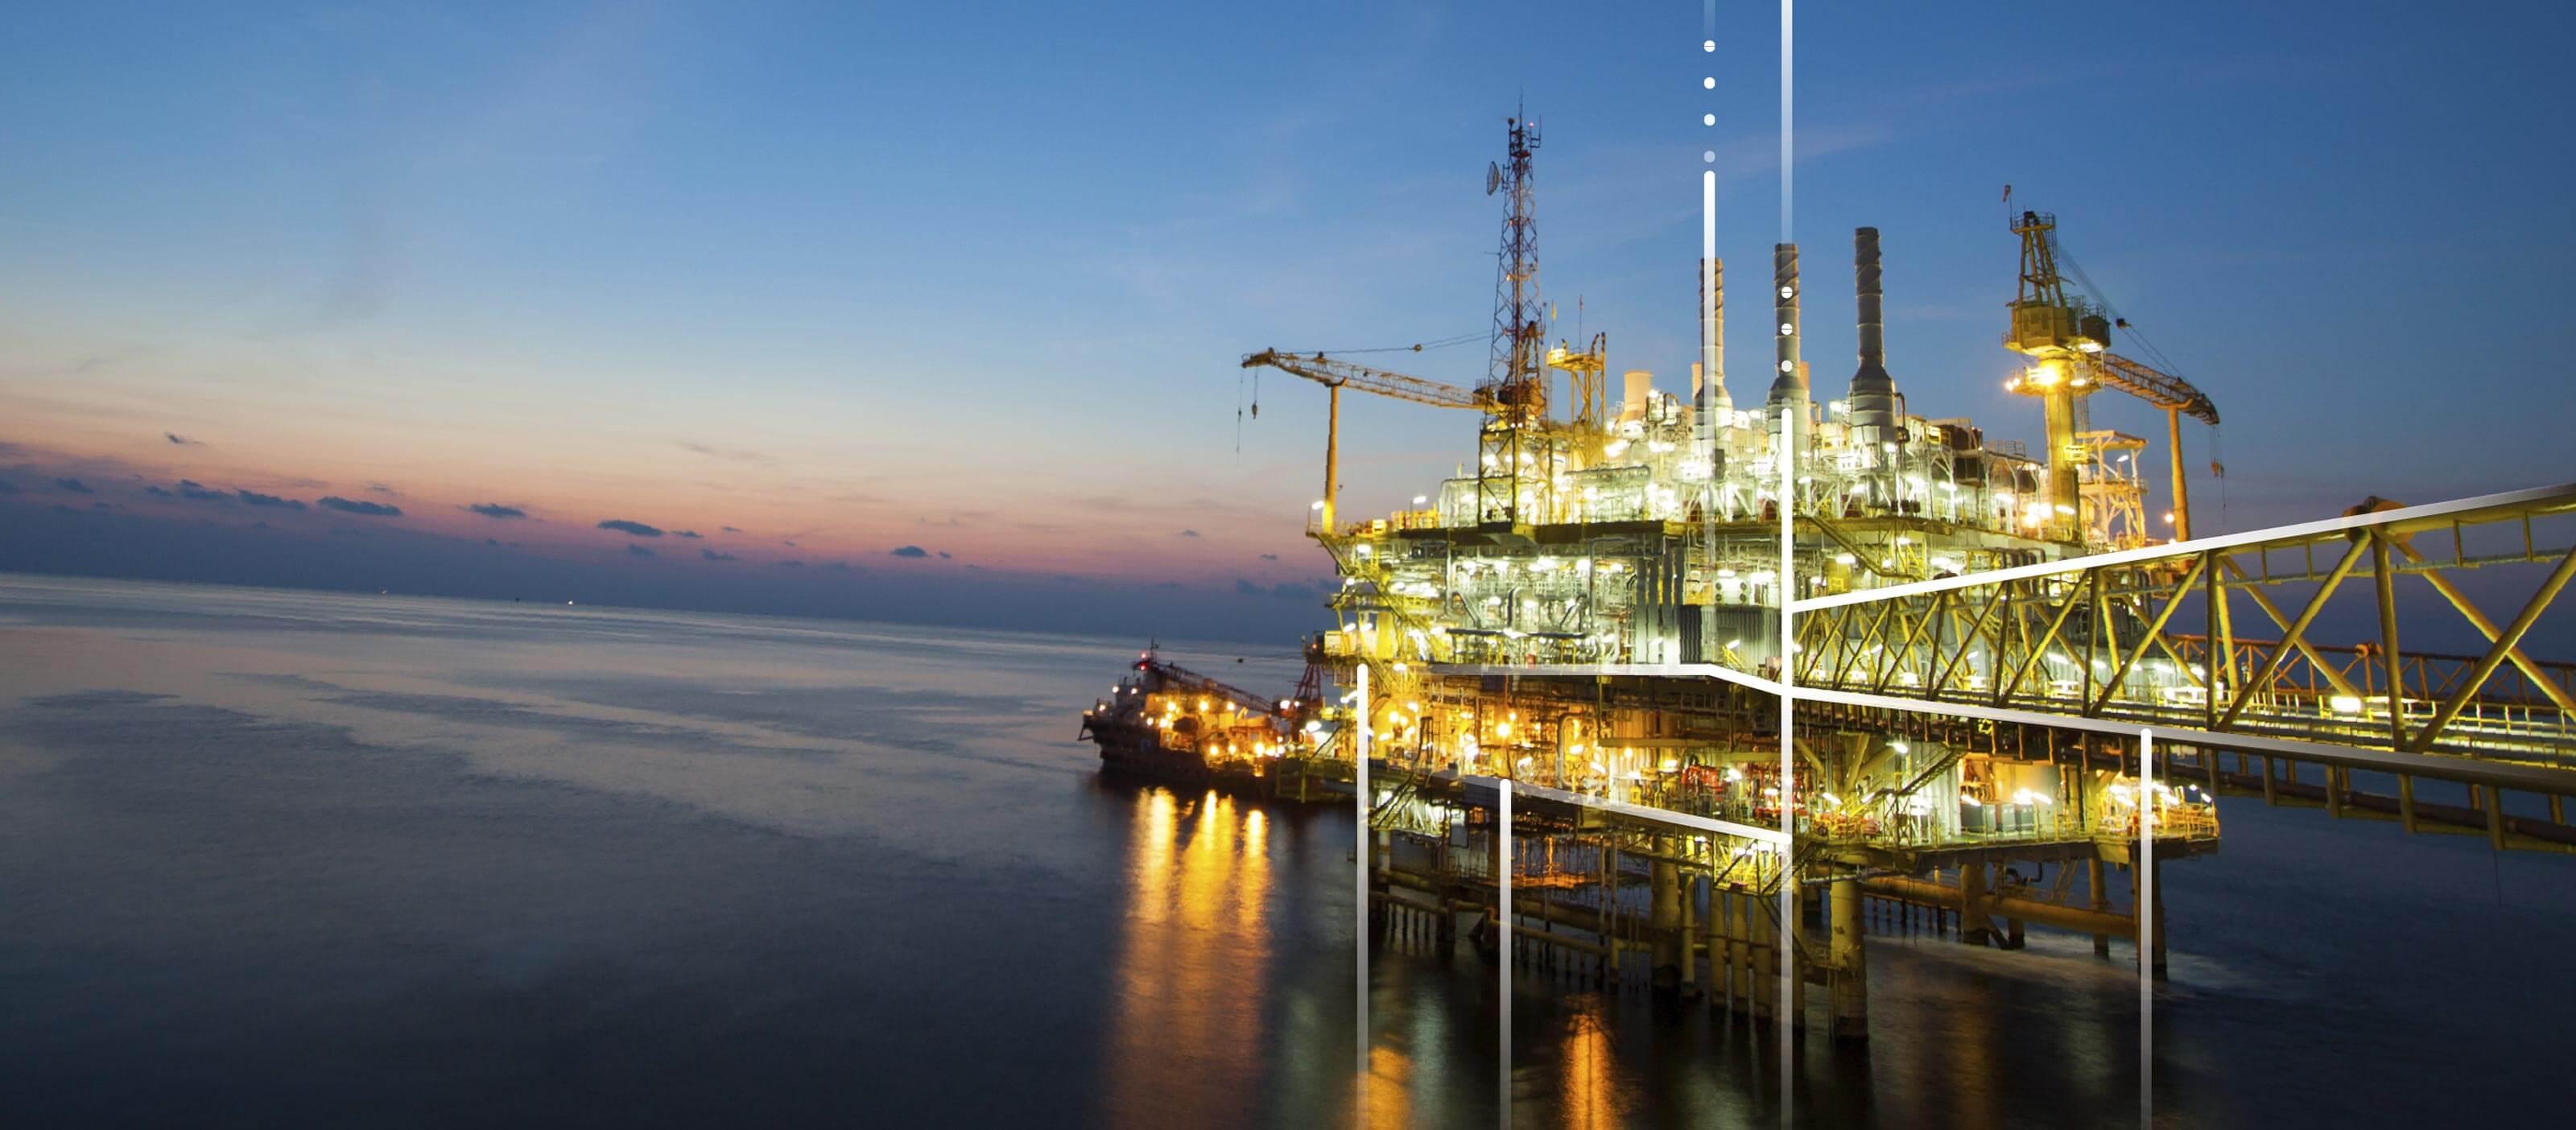 Off-shore oil platformOff-shore oil platform